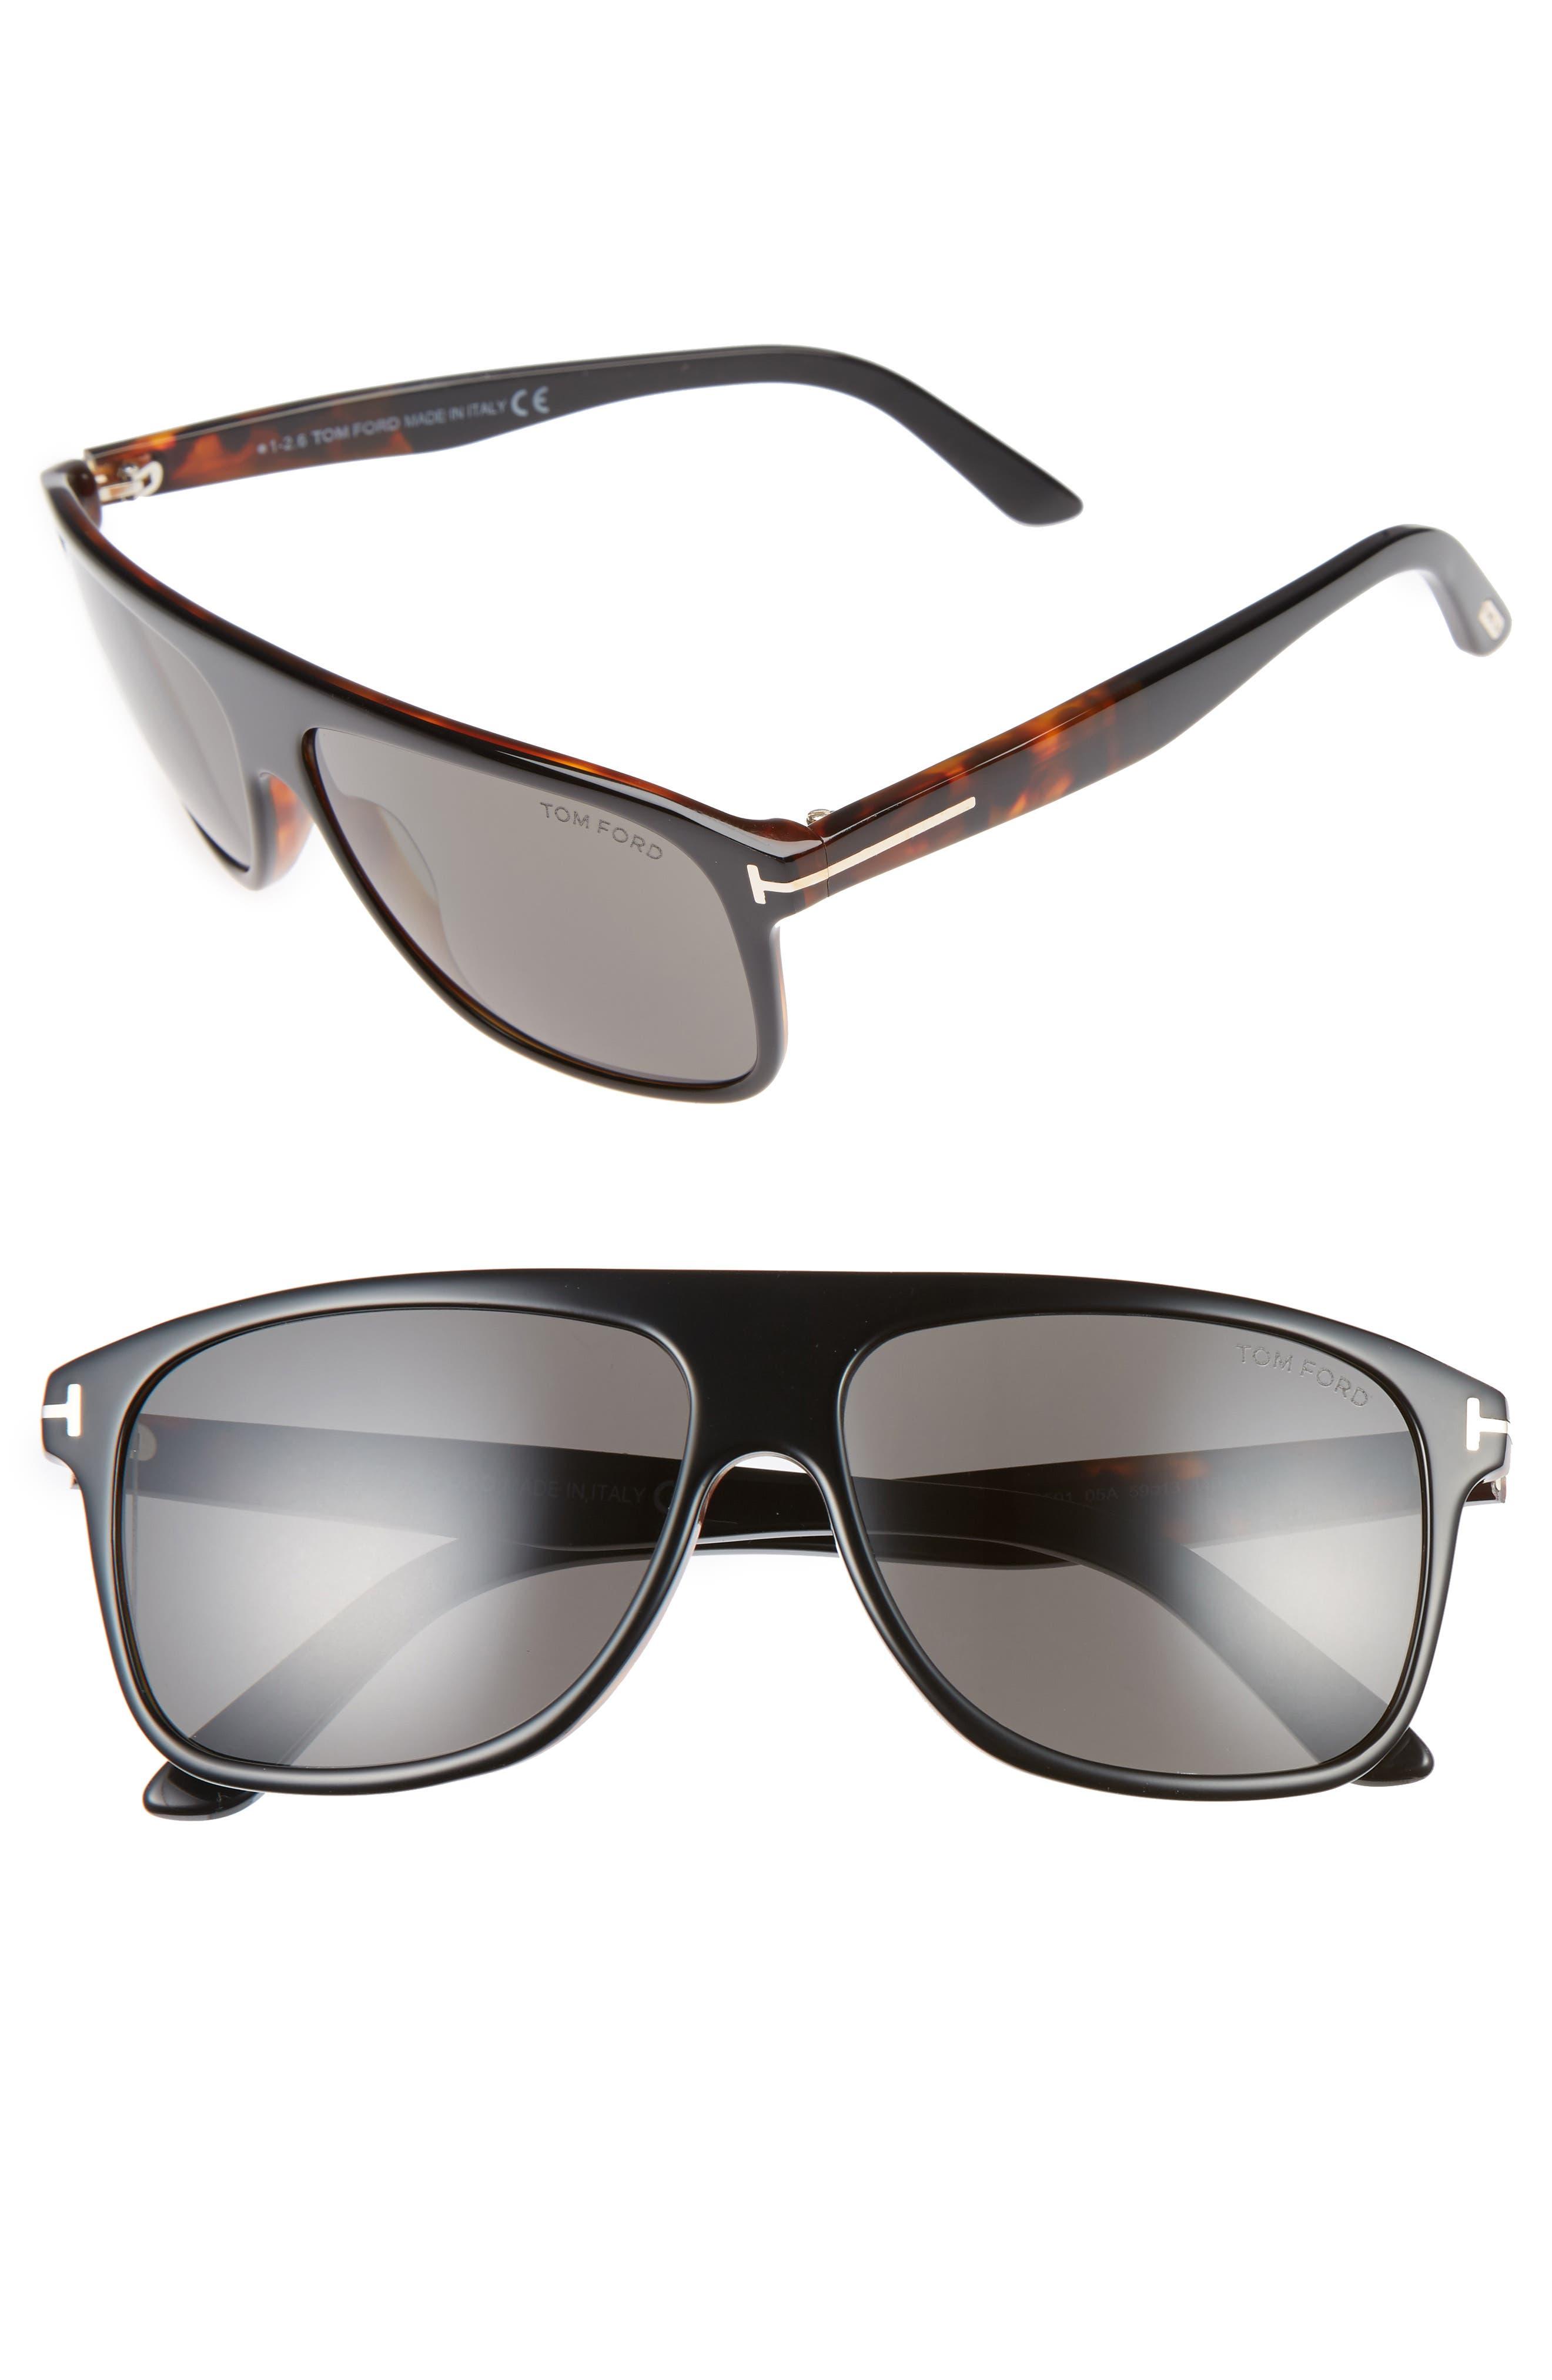 Alternate Image 1 Selected - Tom Ford Inigo 59mm Flat Top Sunglasses